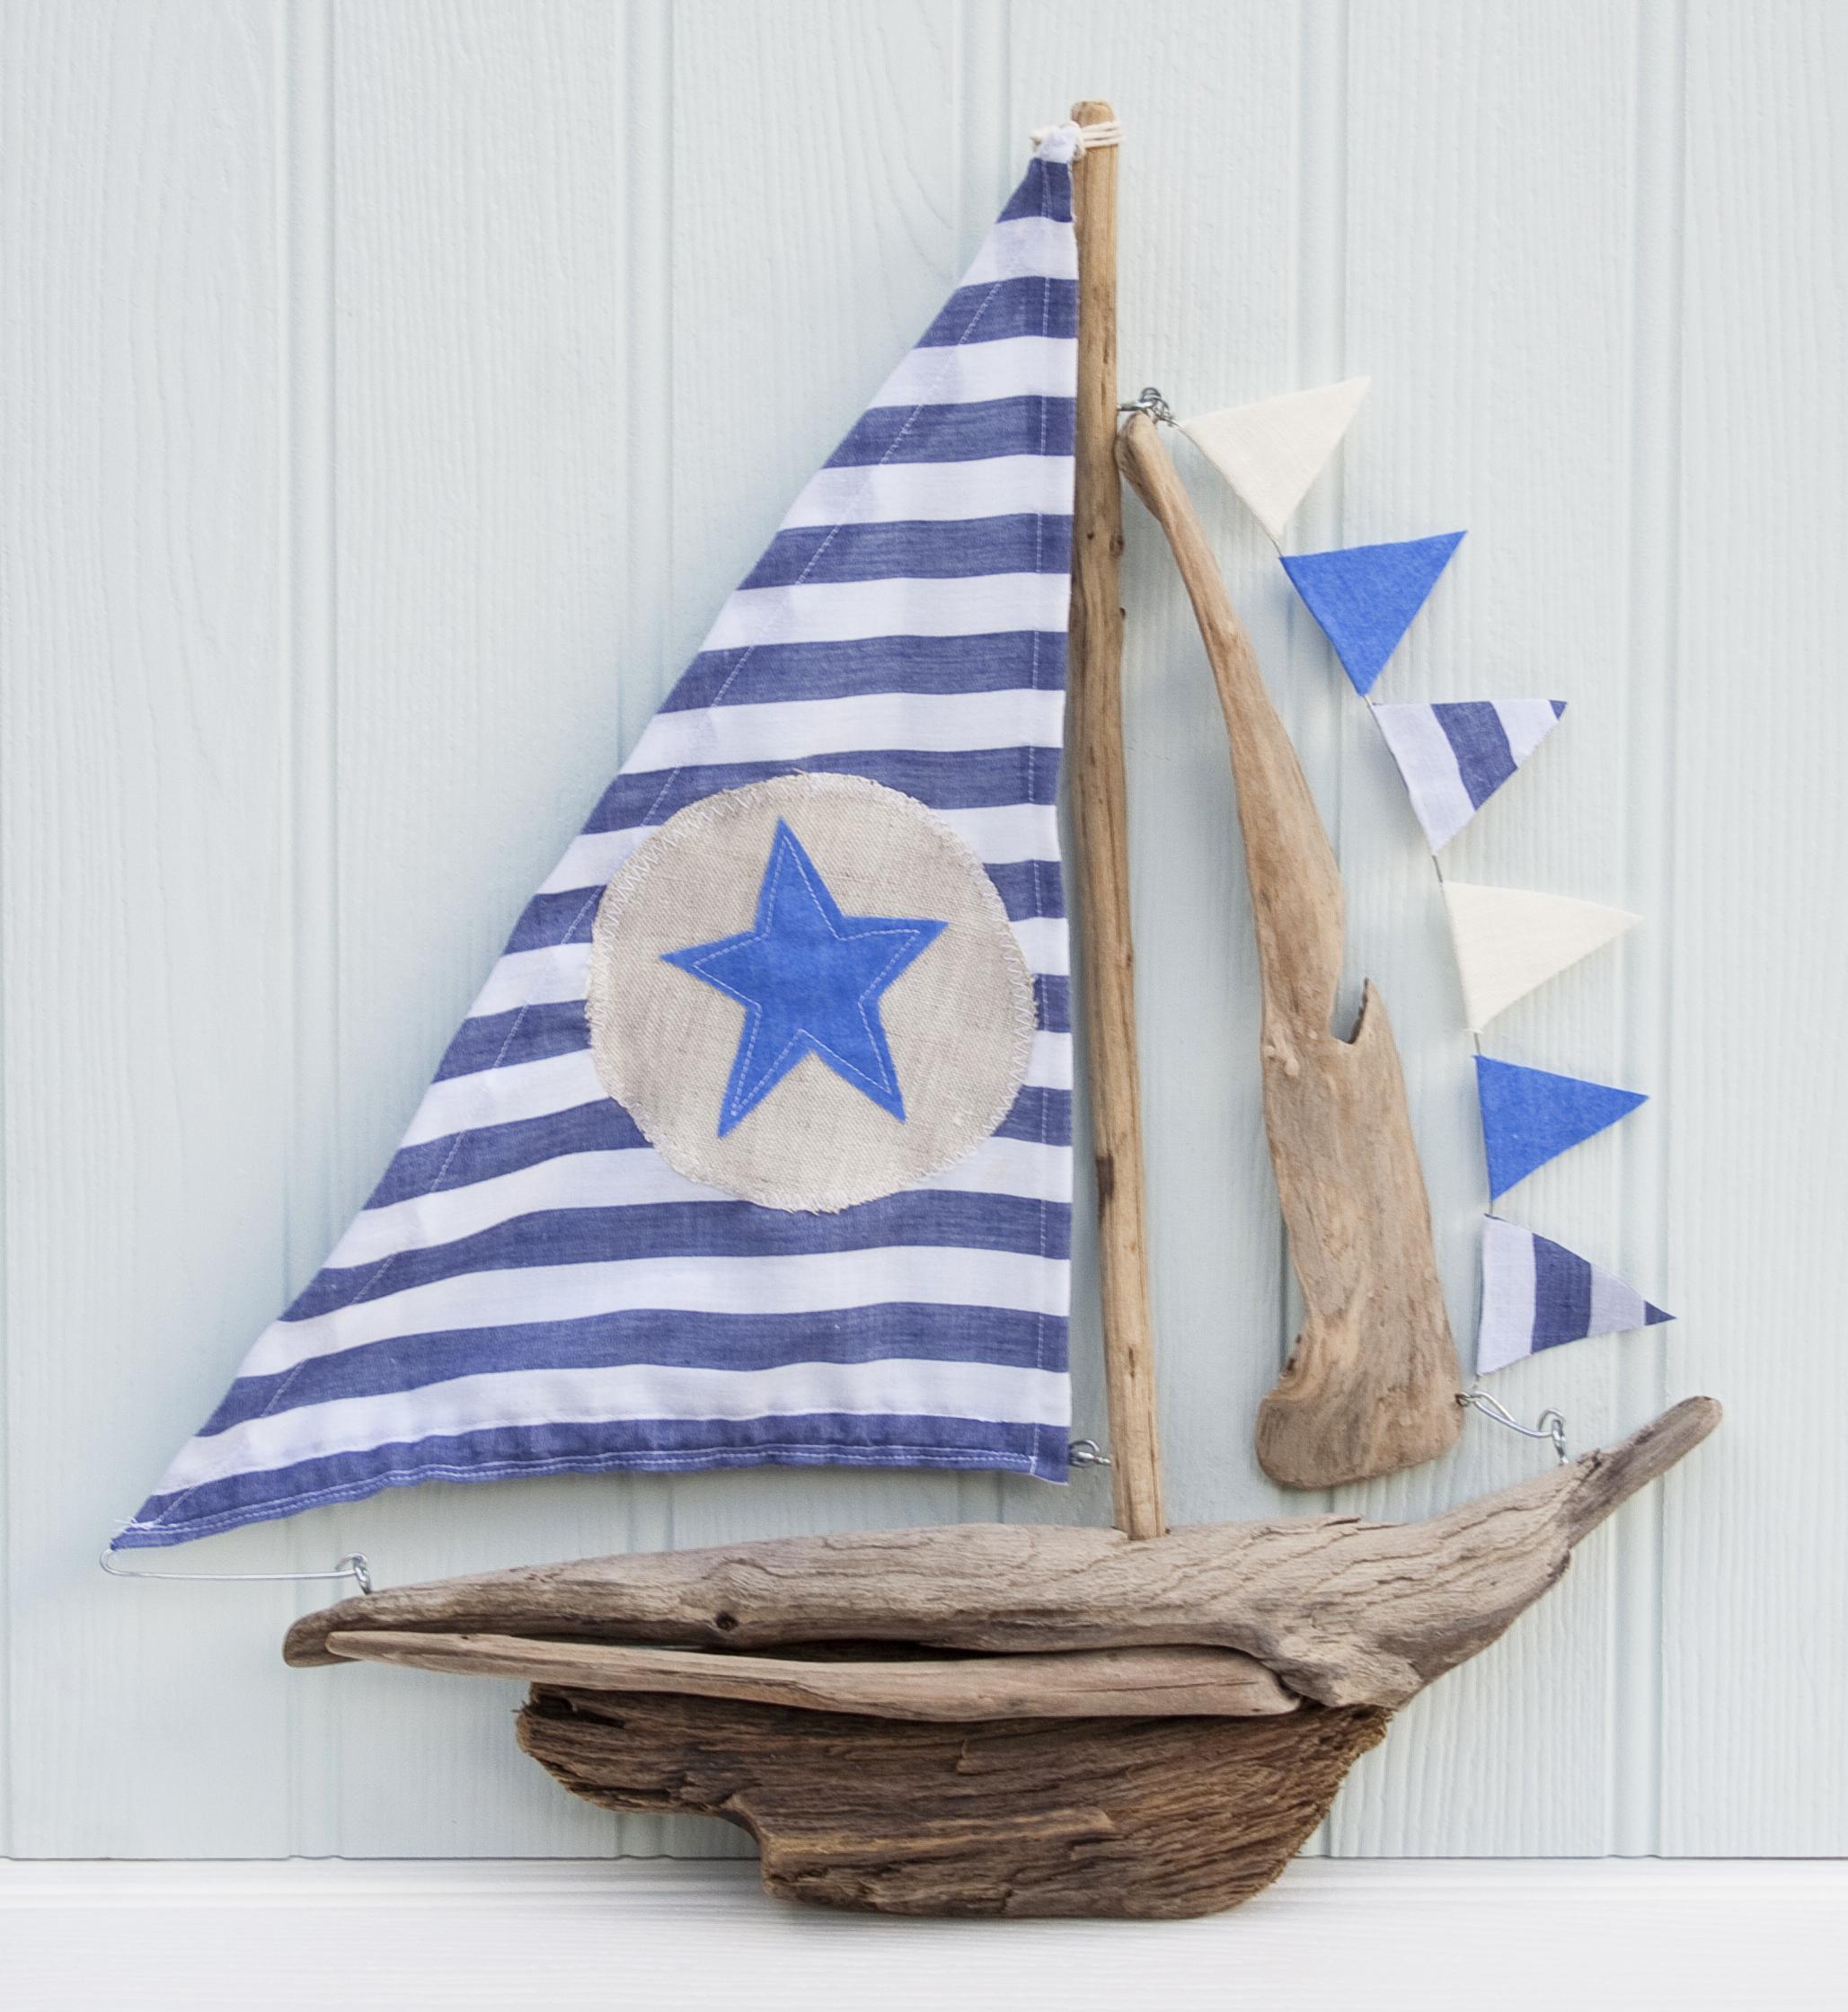 Driftwood Boat - Driftwood Dreaming